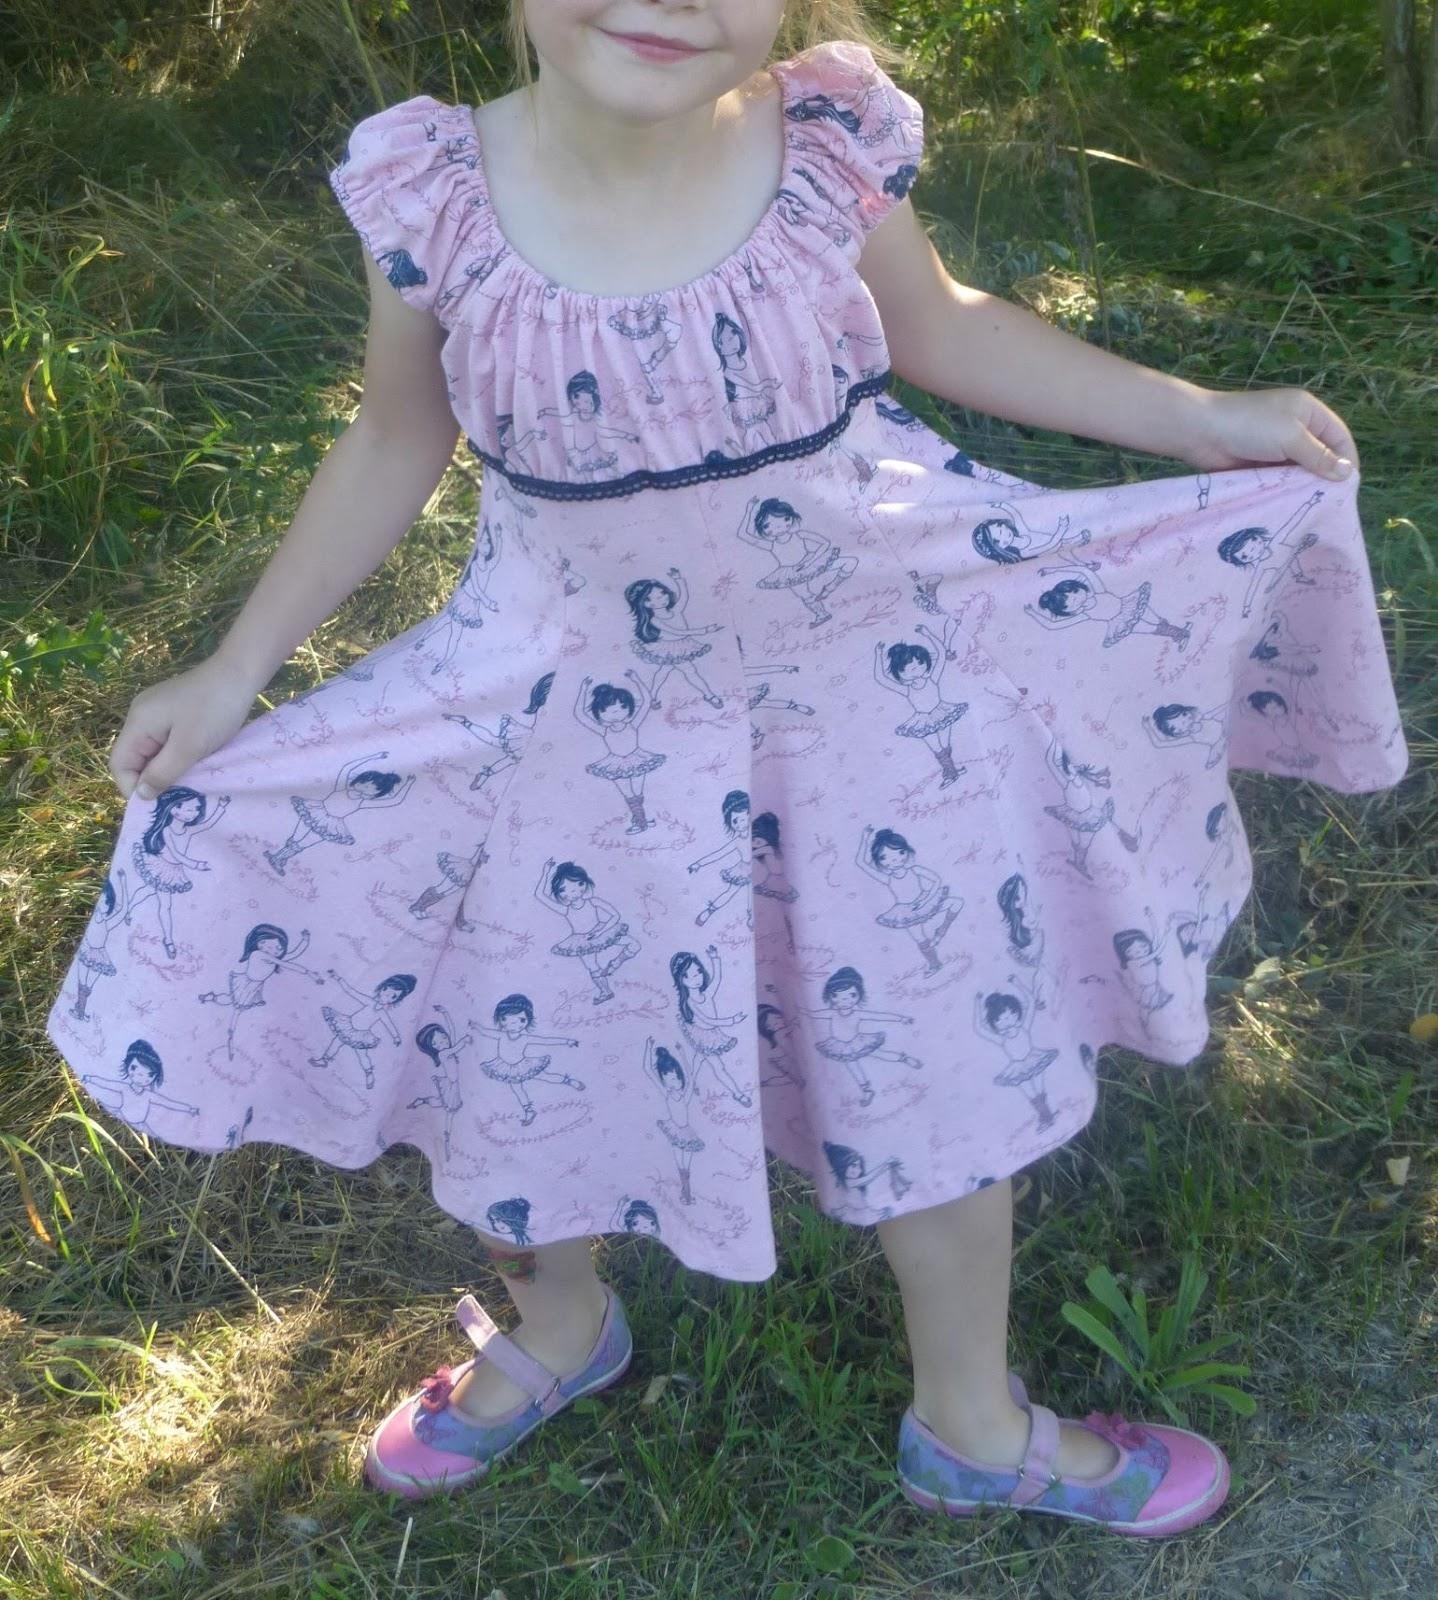 20 Großartig Kleid Einschulung Bester Preis10 Schön Kleid Einschulung Bester Preis